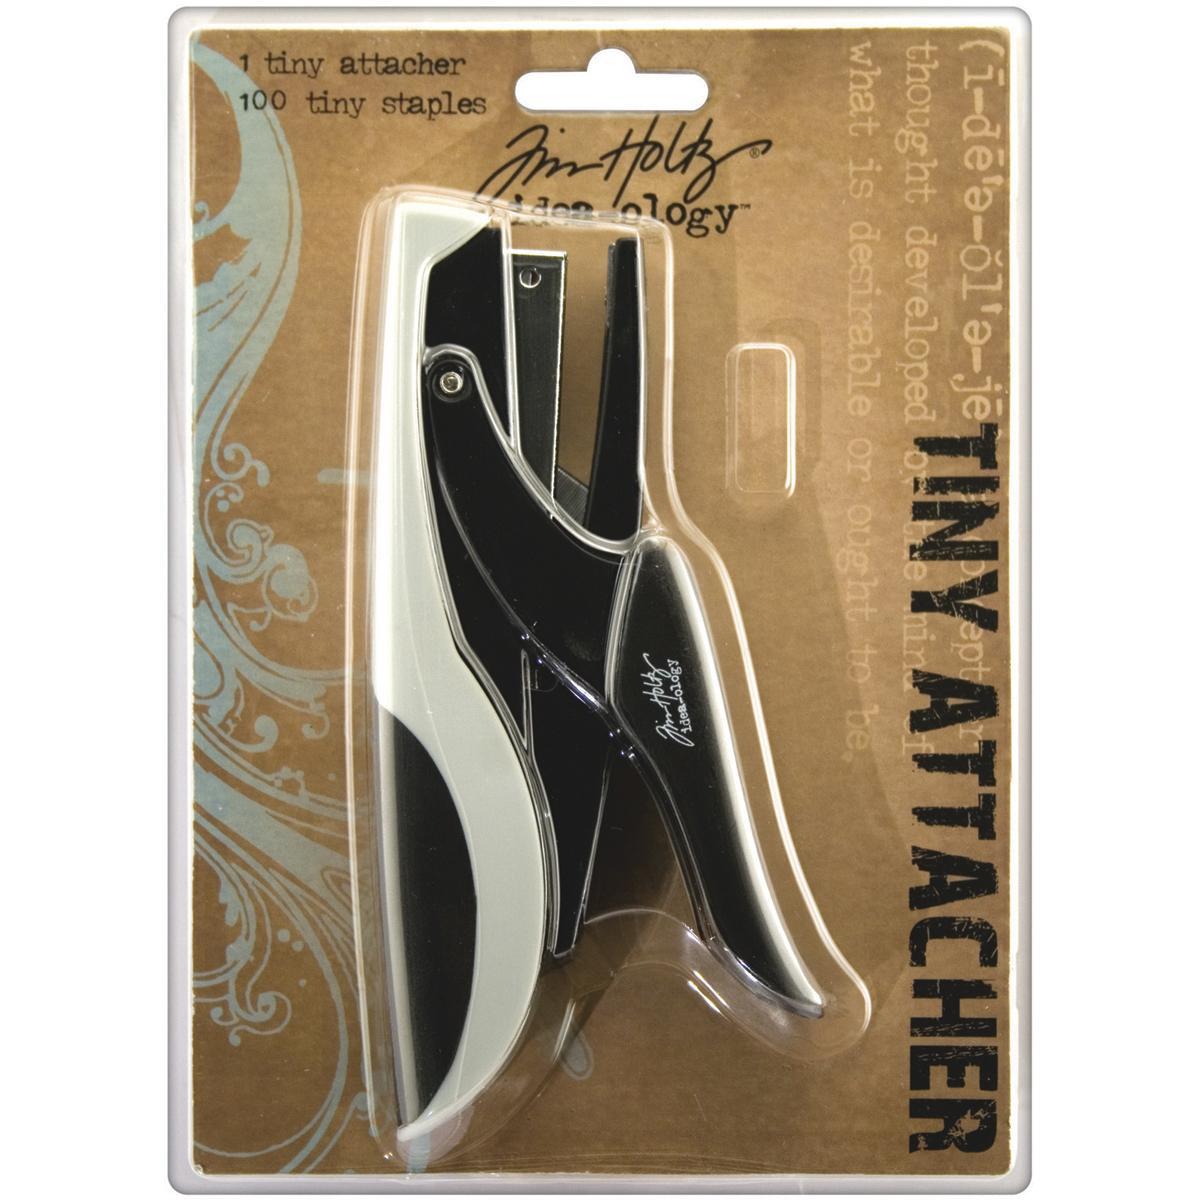 Idea-Ology Tiny Attacher Stapler W/(100) .25 Staples-